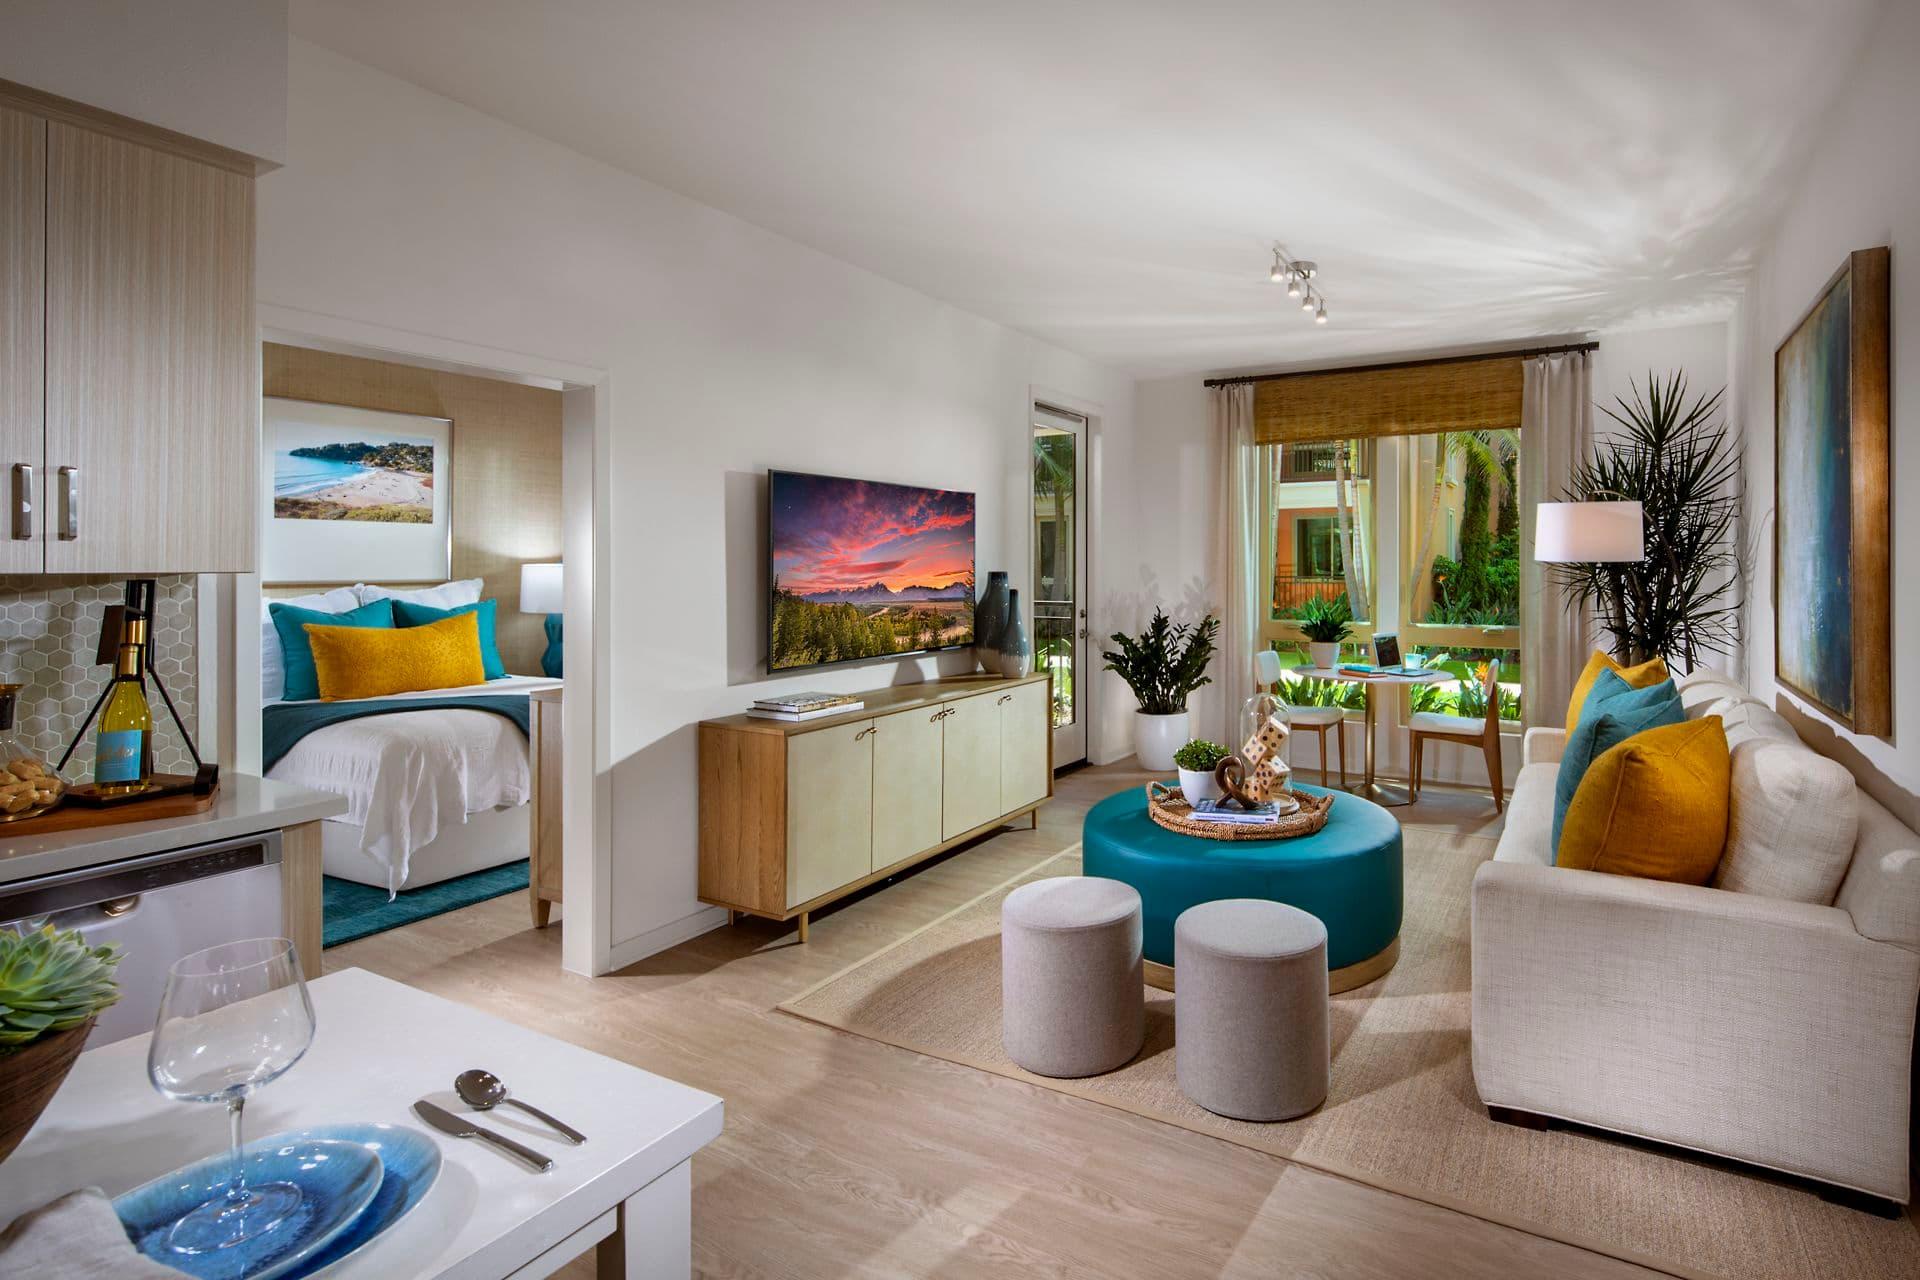 Interior view of living room at Promenade Apartment Homes in Irvine, CA.